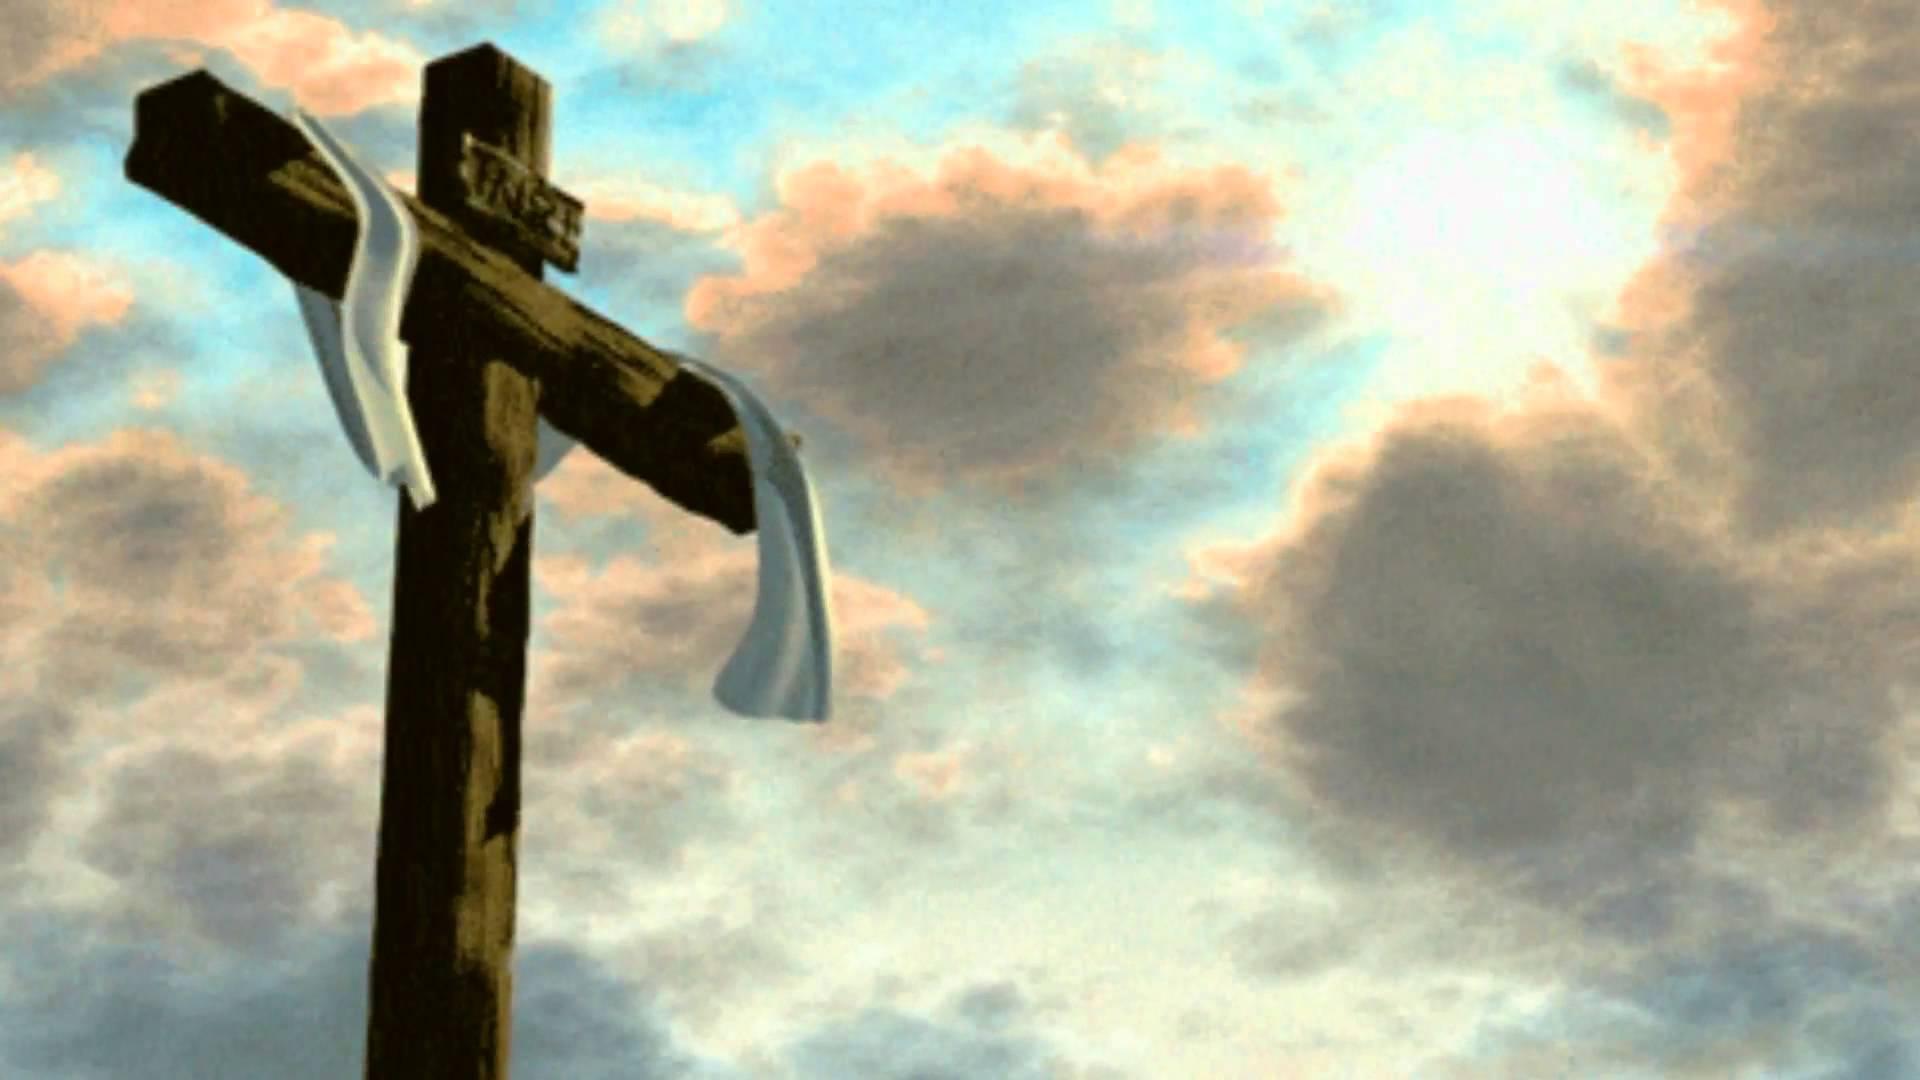 Jesus Cross HD Wallpapers 1080p